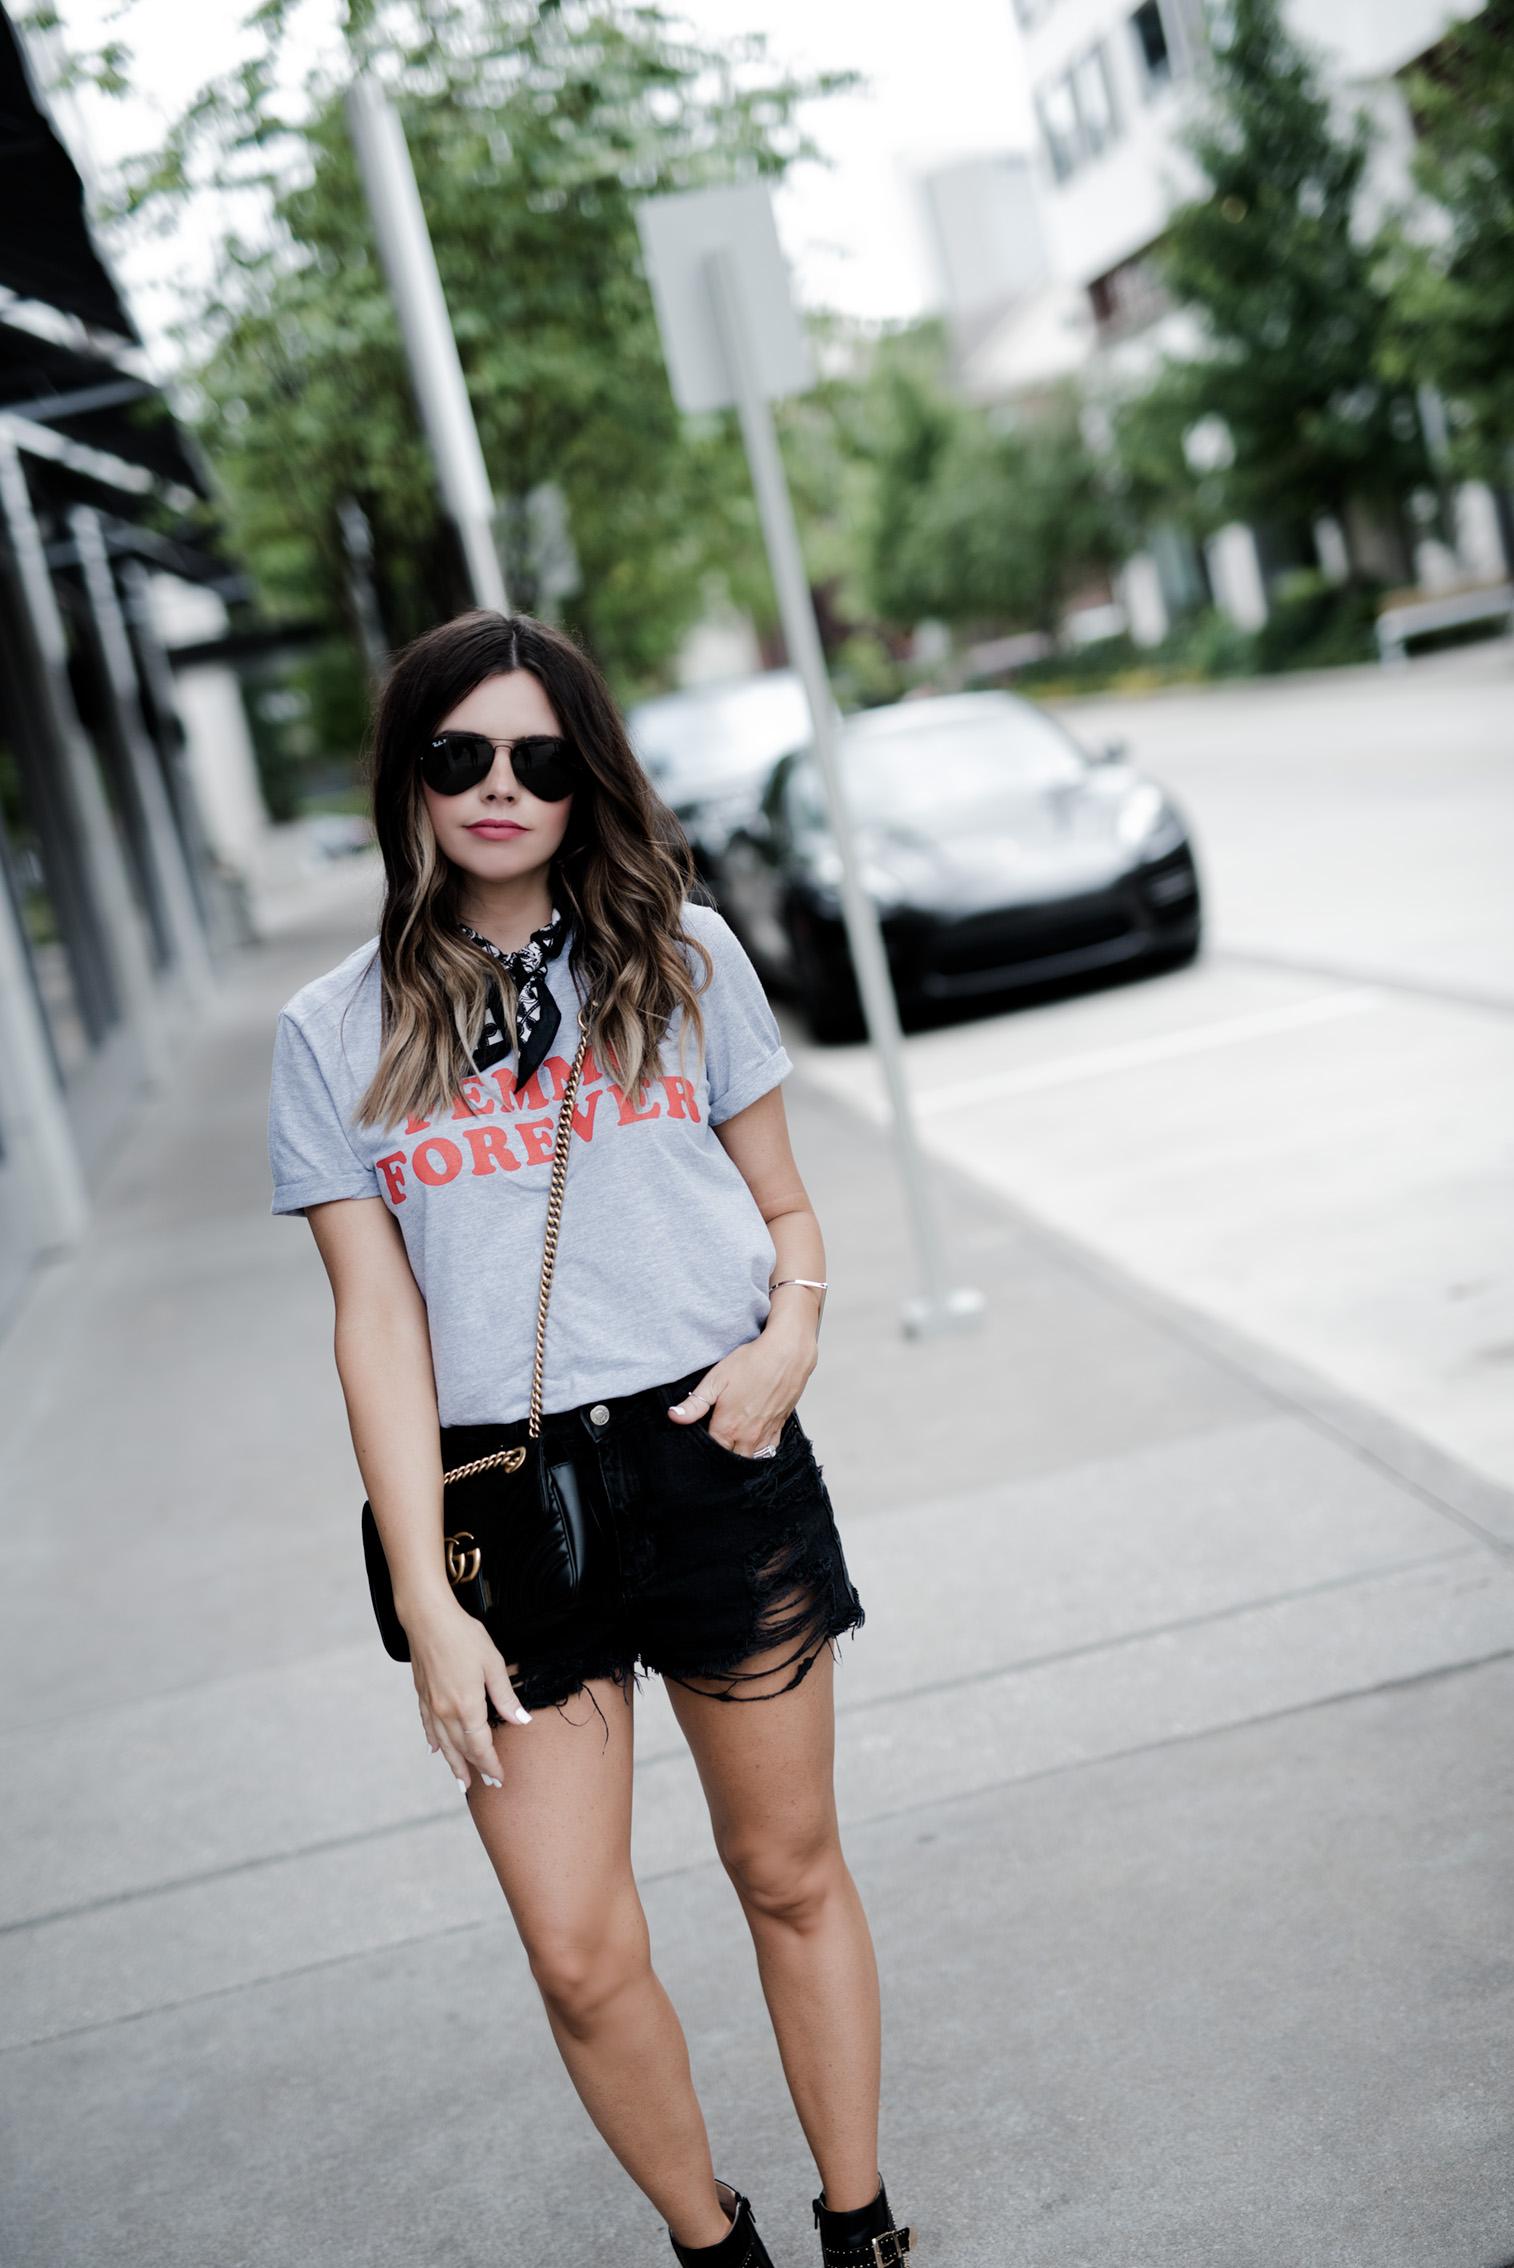 Tiffany Jais Houston fashion and lifestyle blogger   street style, Graphic tee's, necktie scarf outfits,